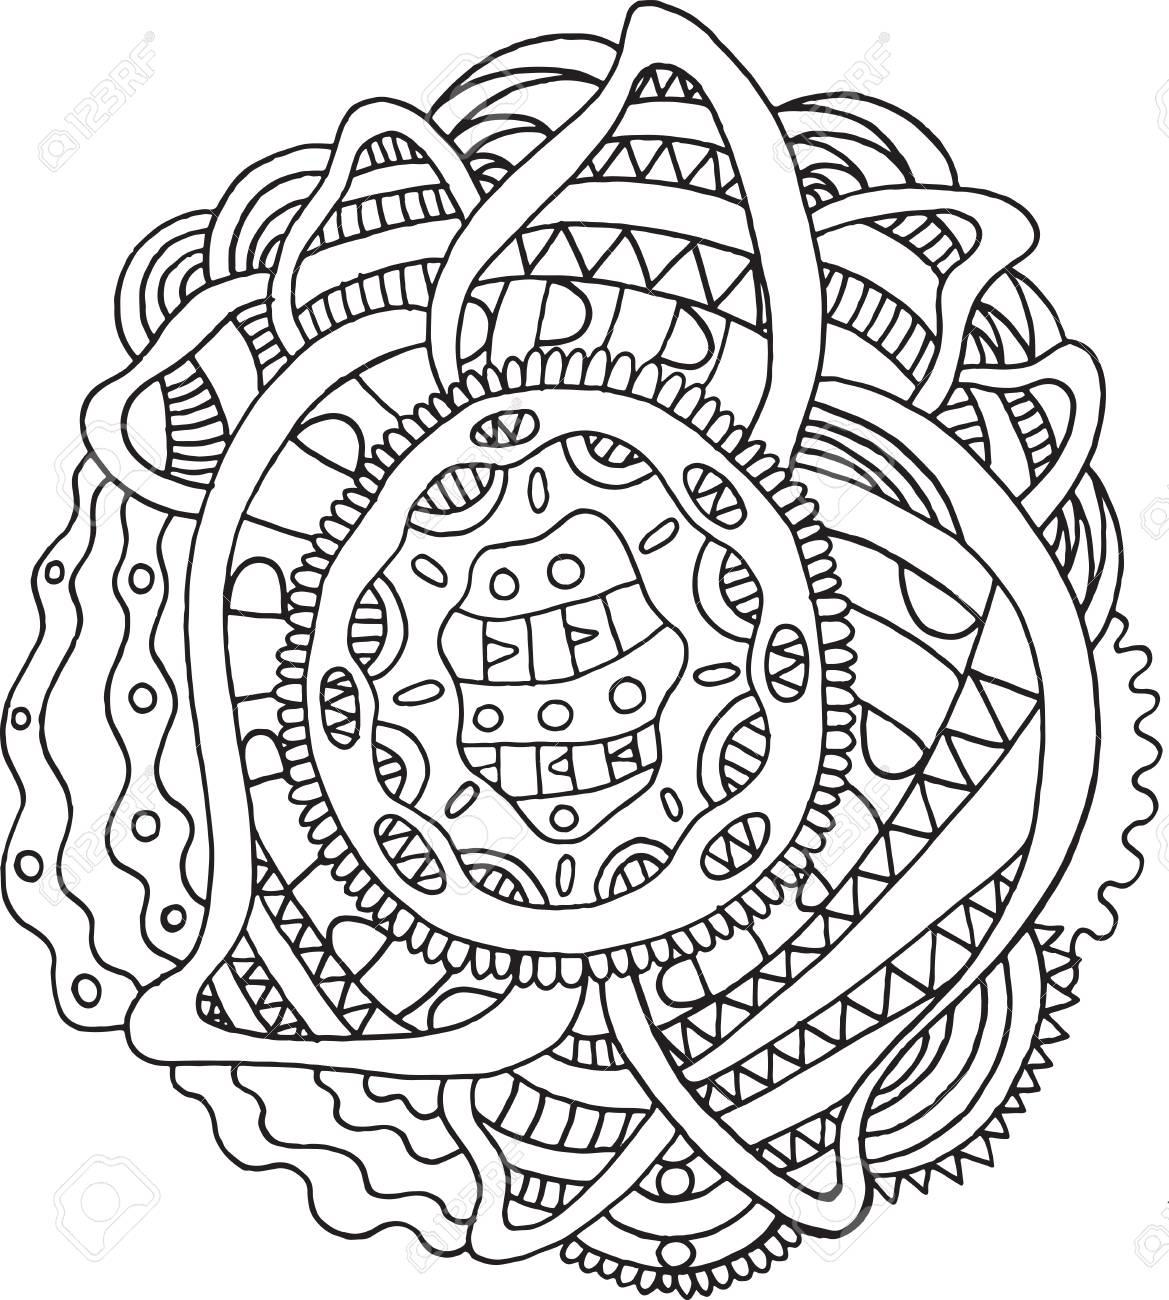 Doodle Mandala - Malvorlagen Für Erwachsene. Meditative Boho-Cartoon ...